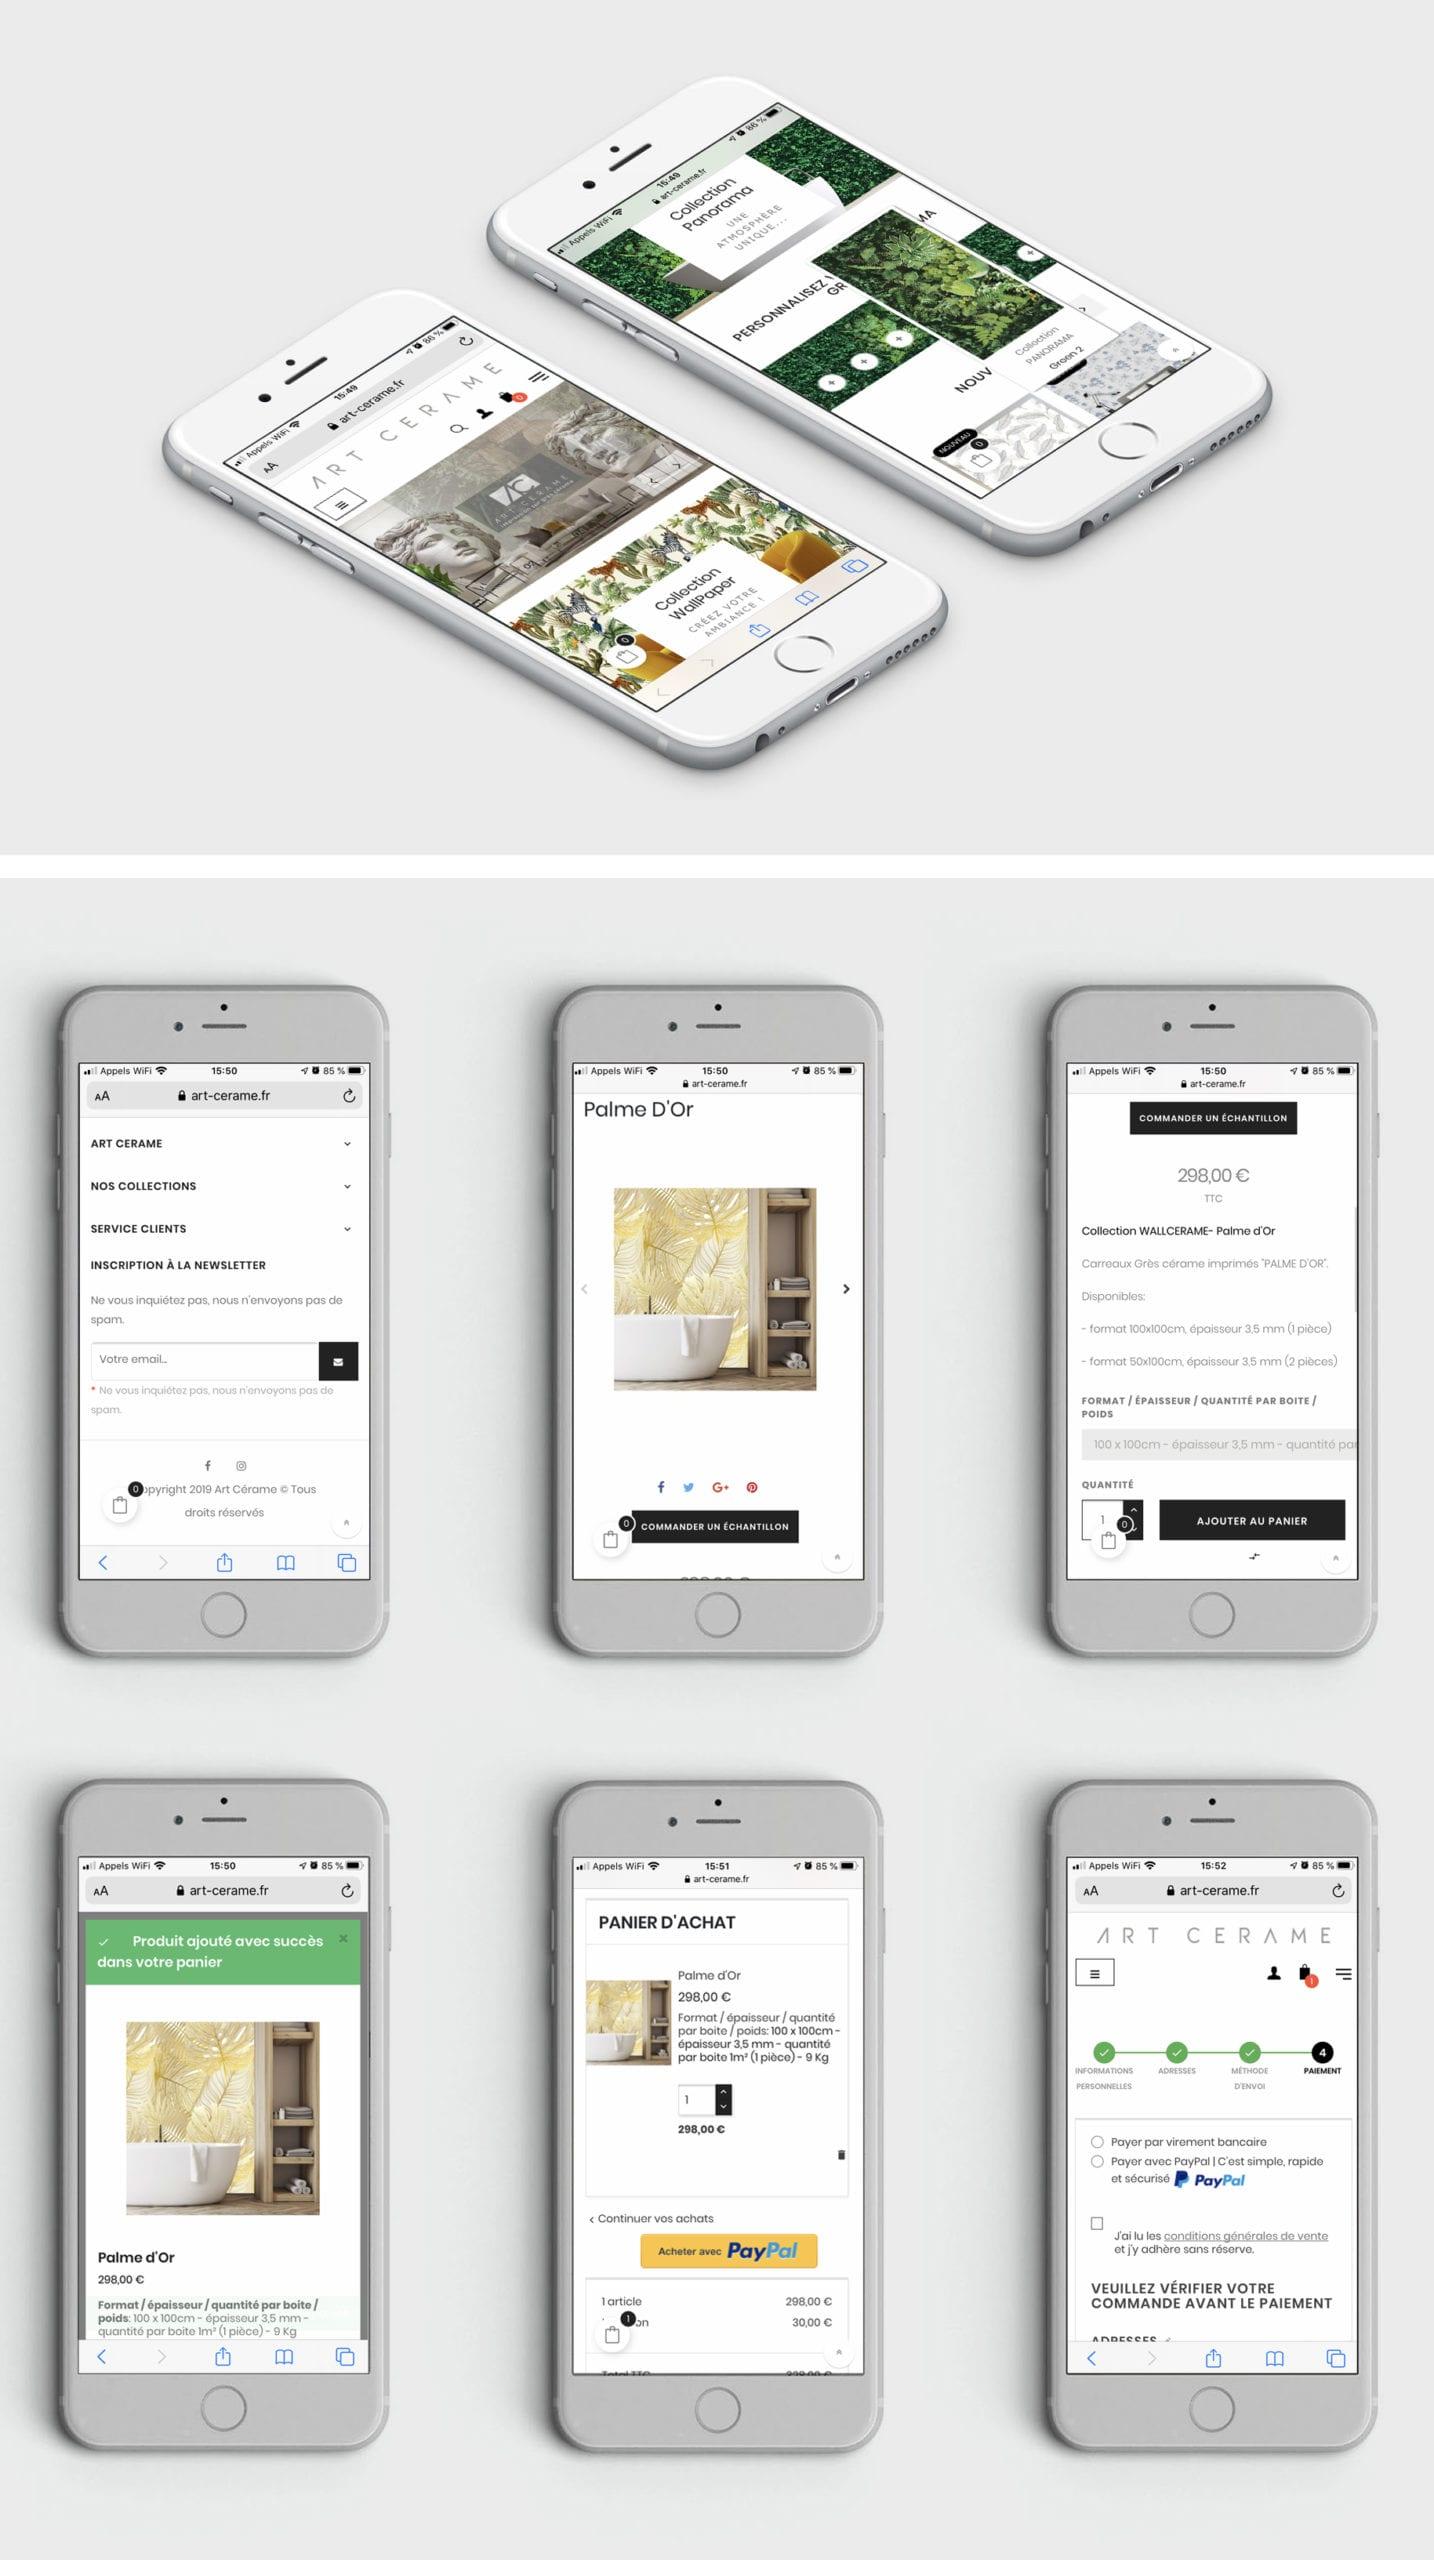 ART CERAME - Responsive Smartphone